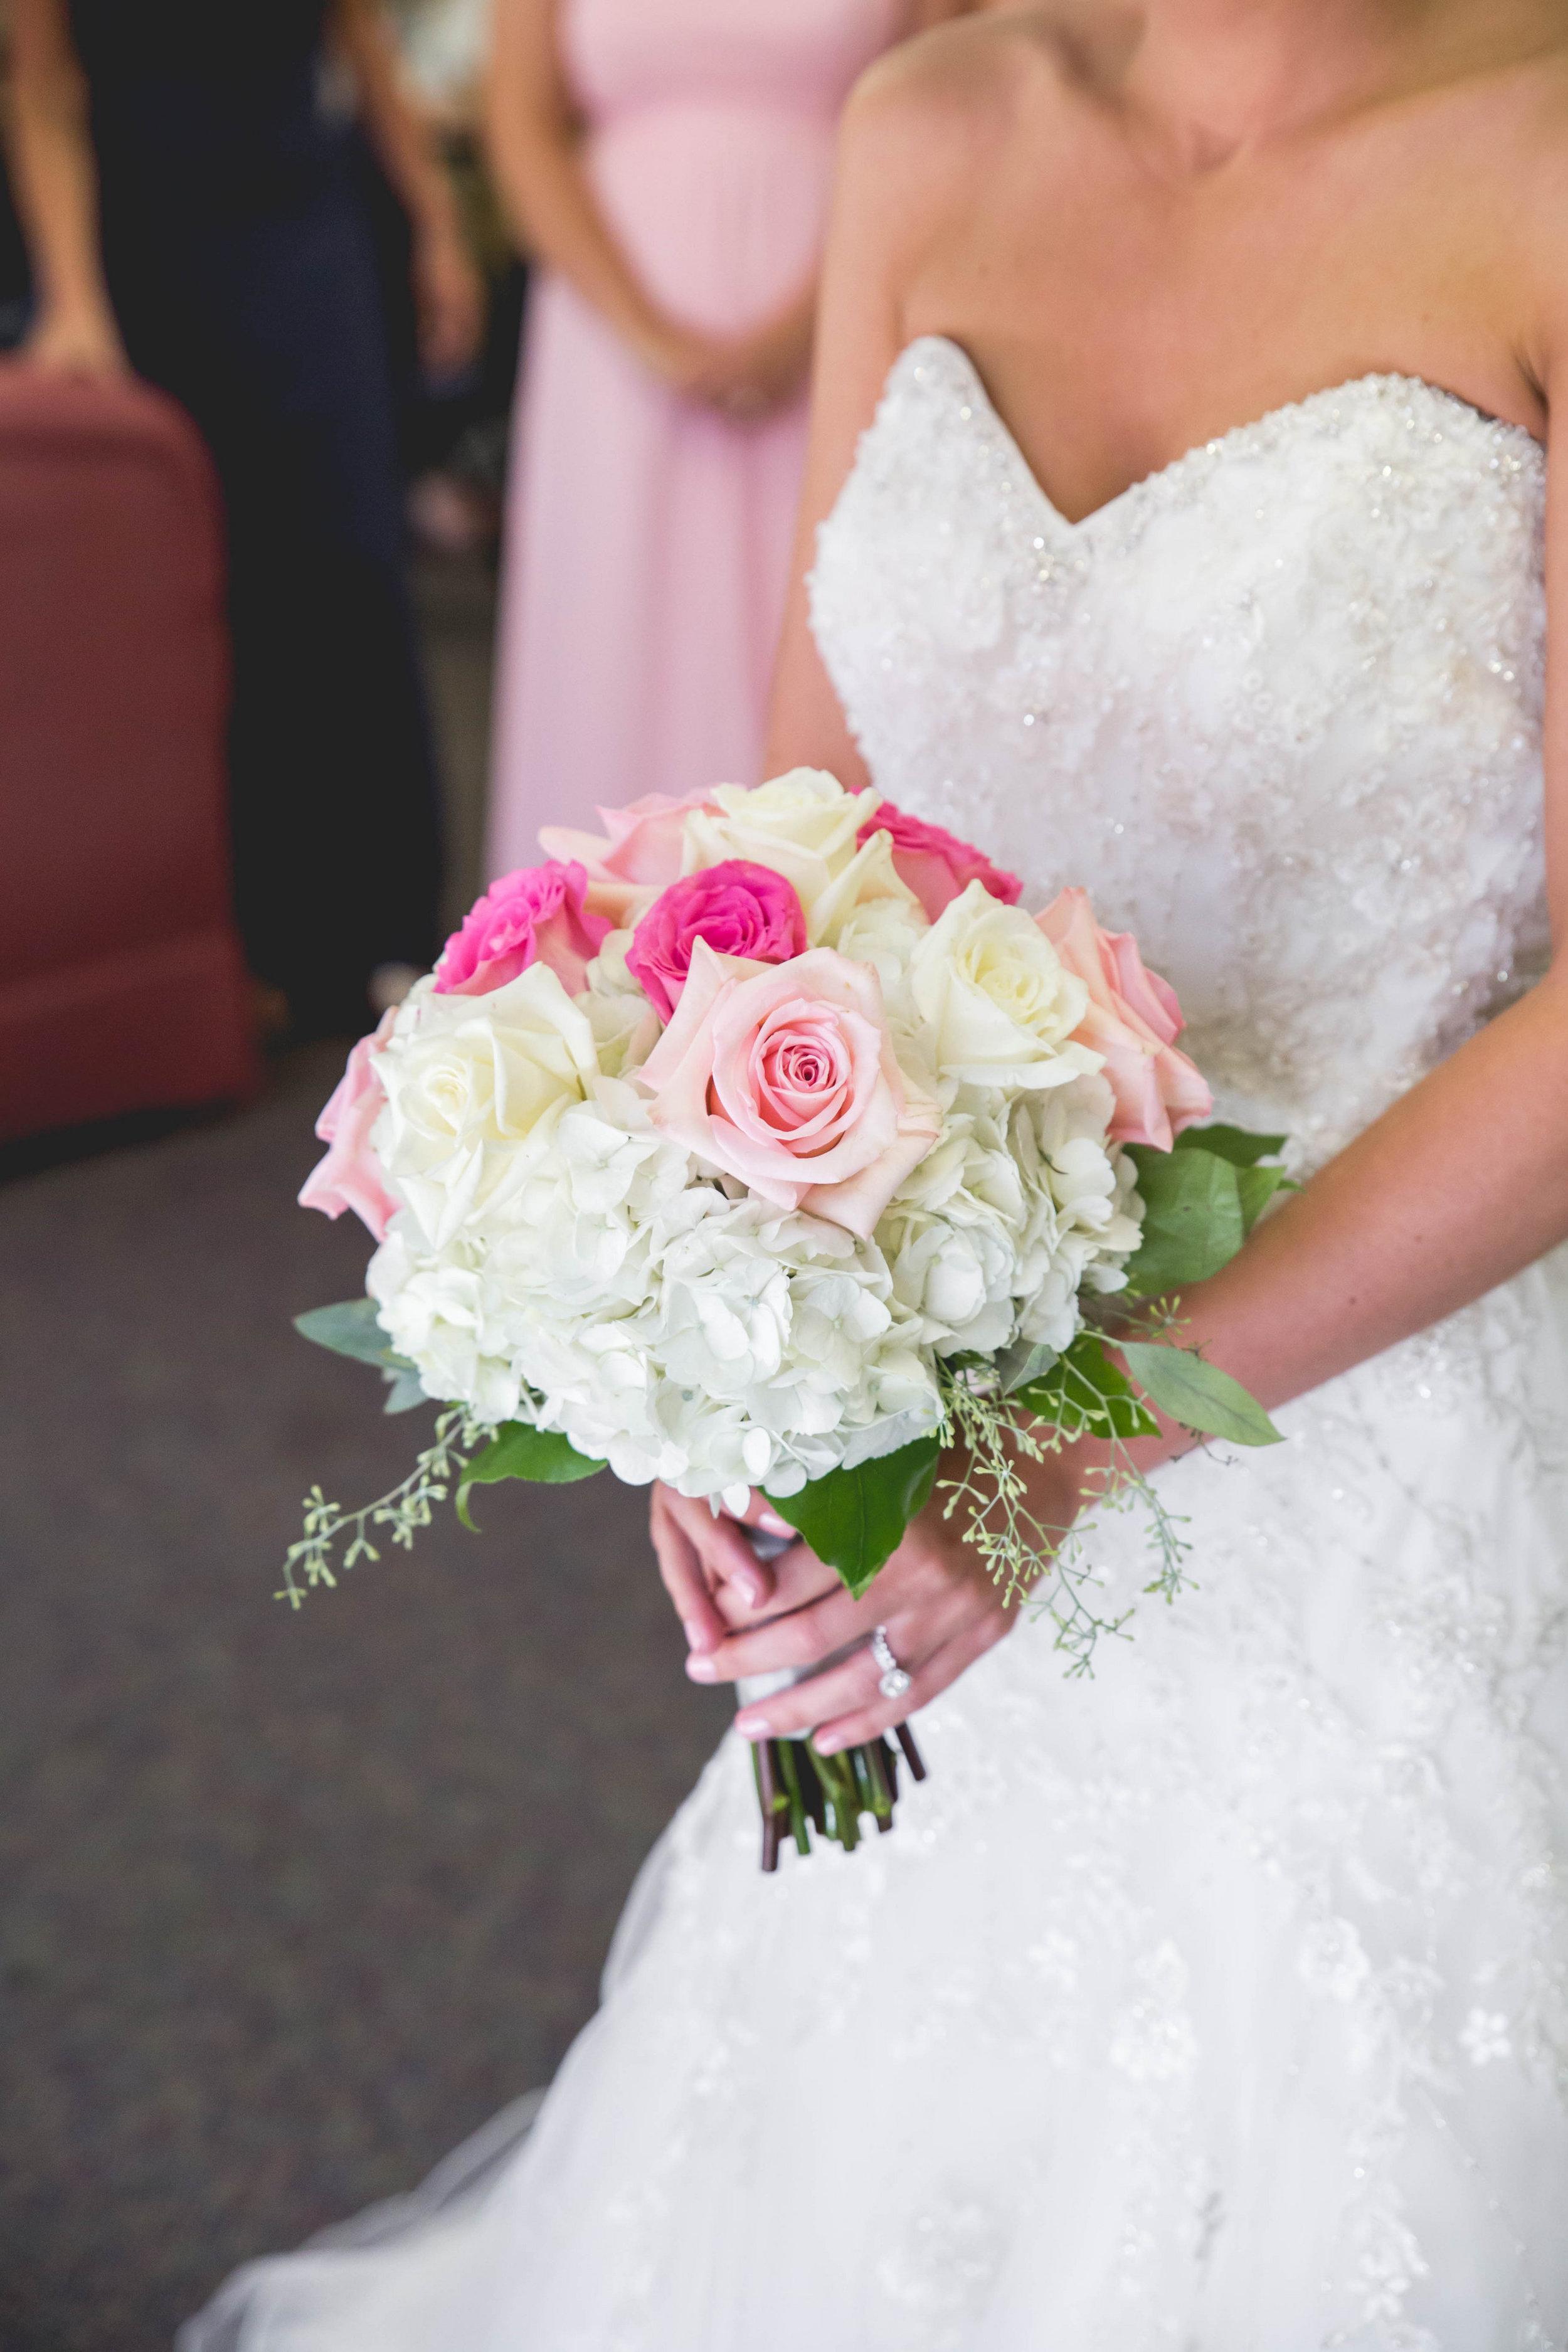 Donelson Wedding-Donelson-0042.jpg